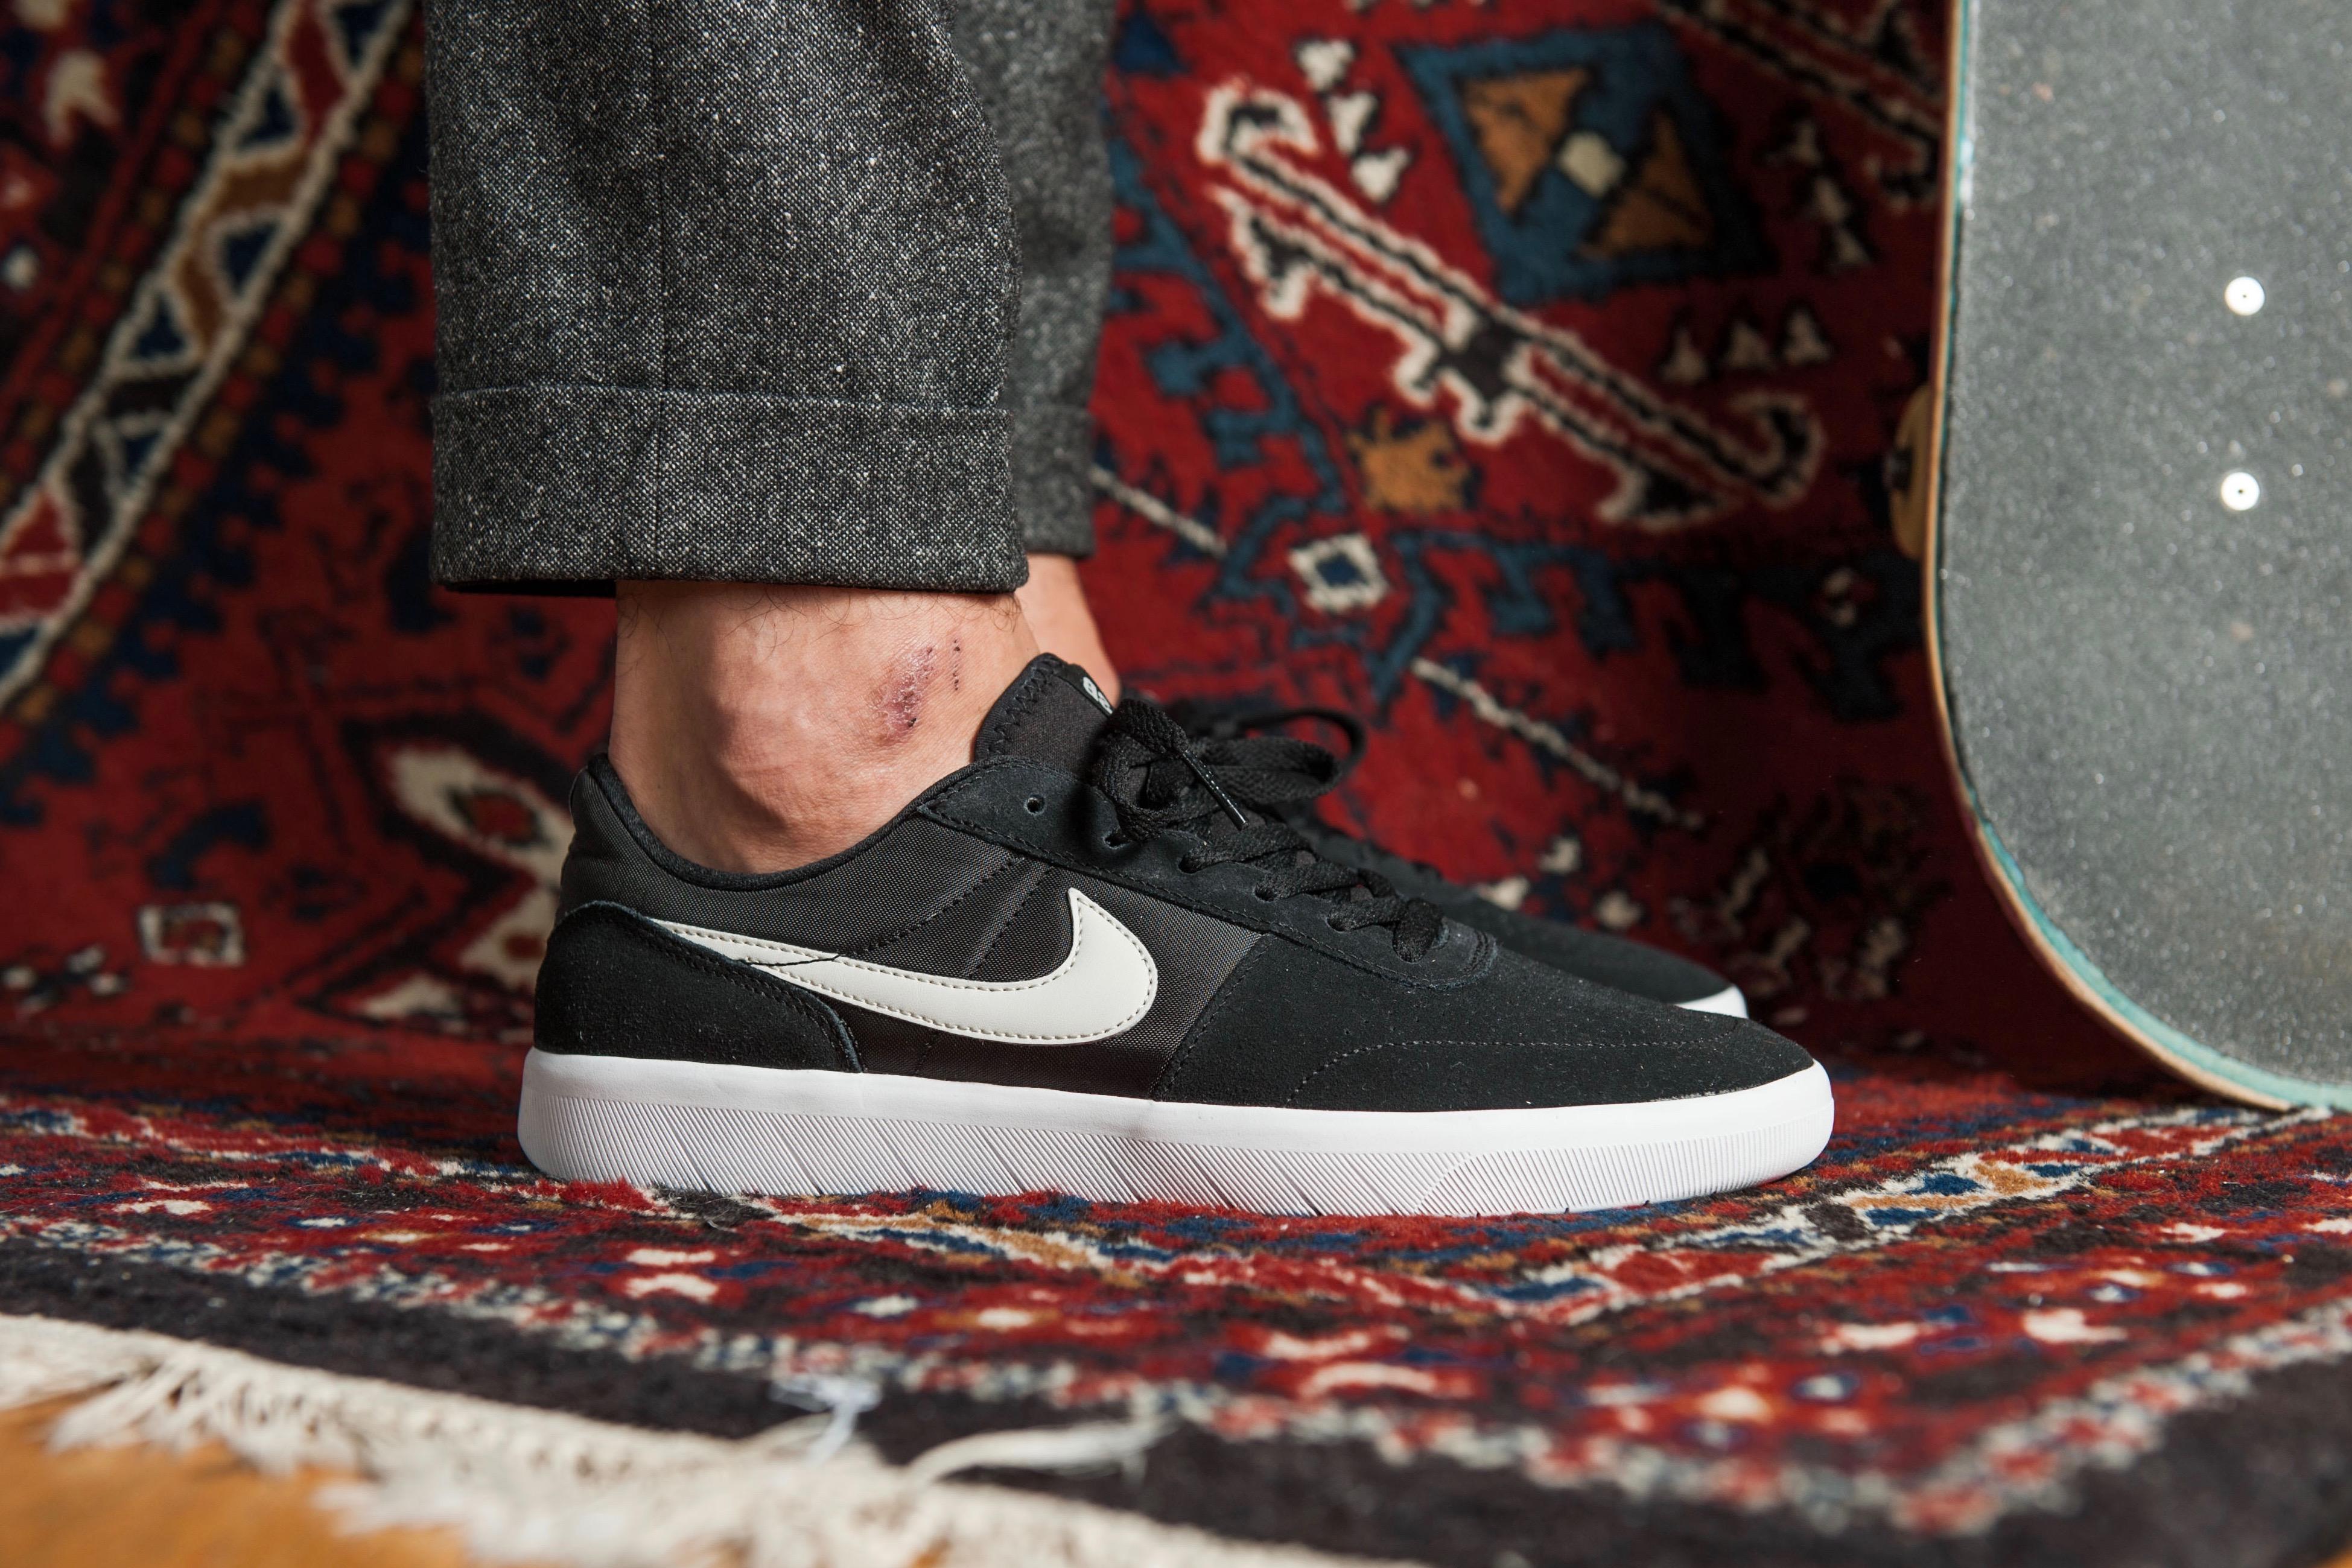 Nike SB Team Classic – Black / White